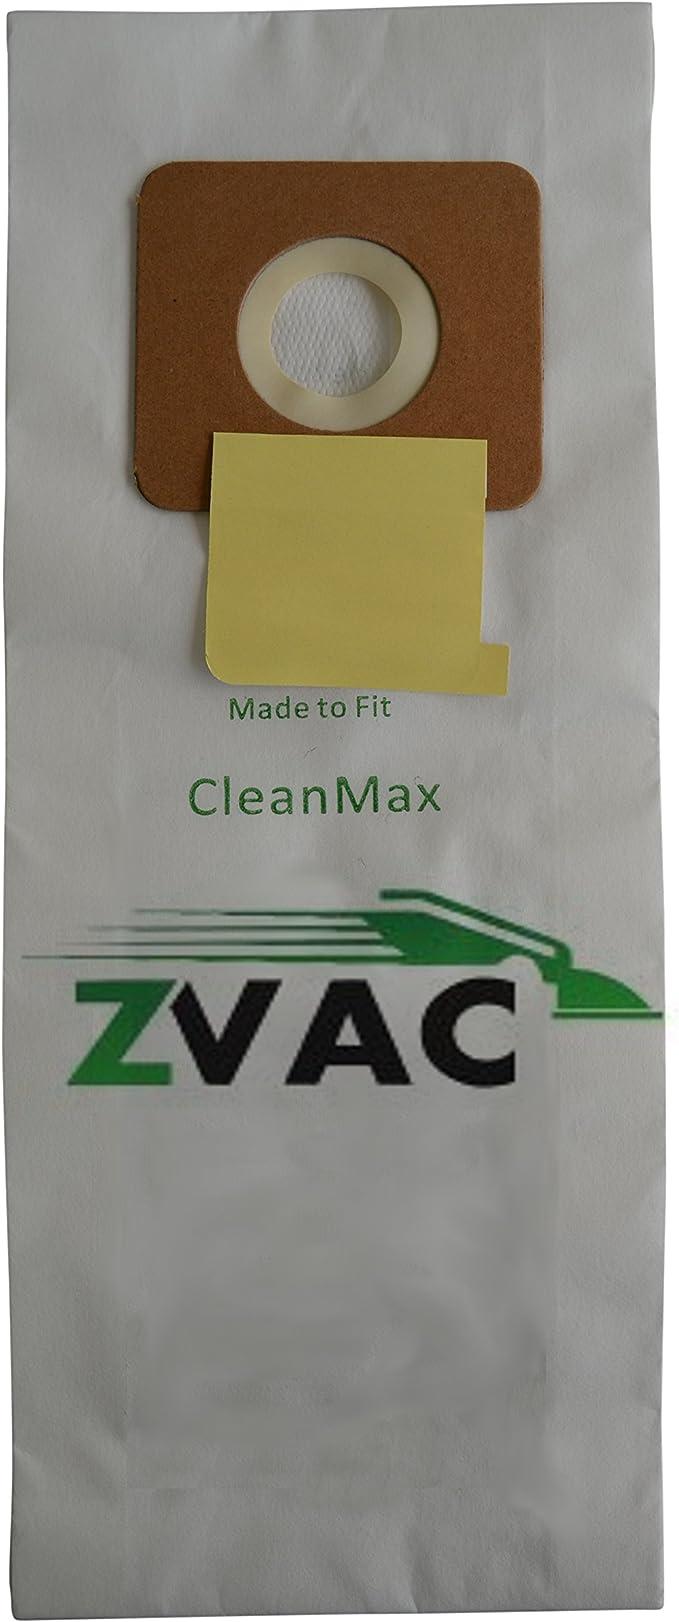 cleanmax Pro-Series, cadetes (similar a oem-cmp, 06.267) Filtro Bolsas por ZVac: Amazon.es: Hogar